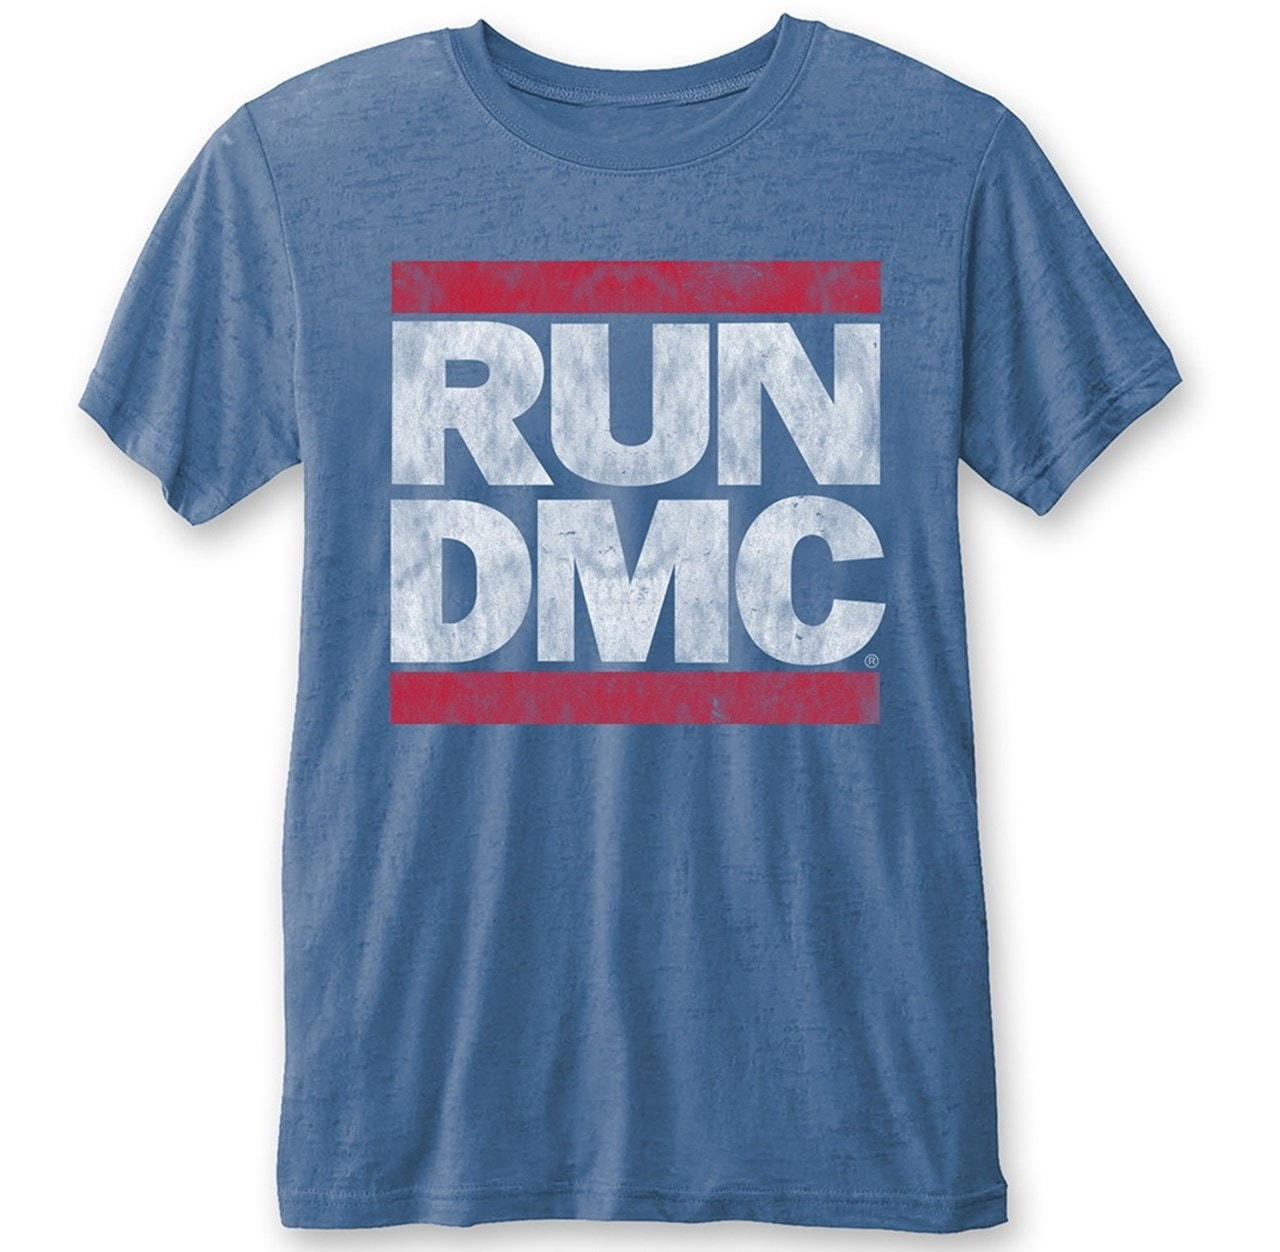 Run DMC: Vintage Logo (Small) - 1